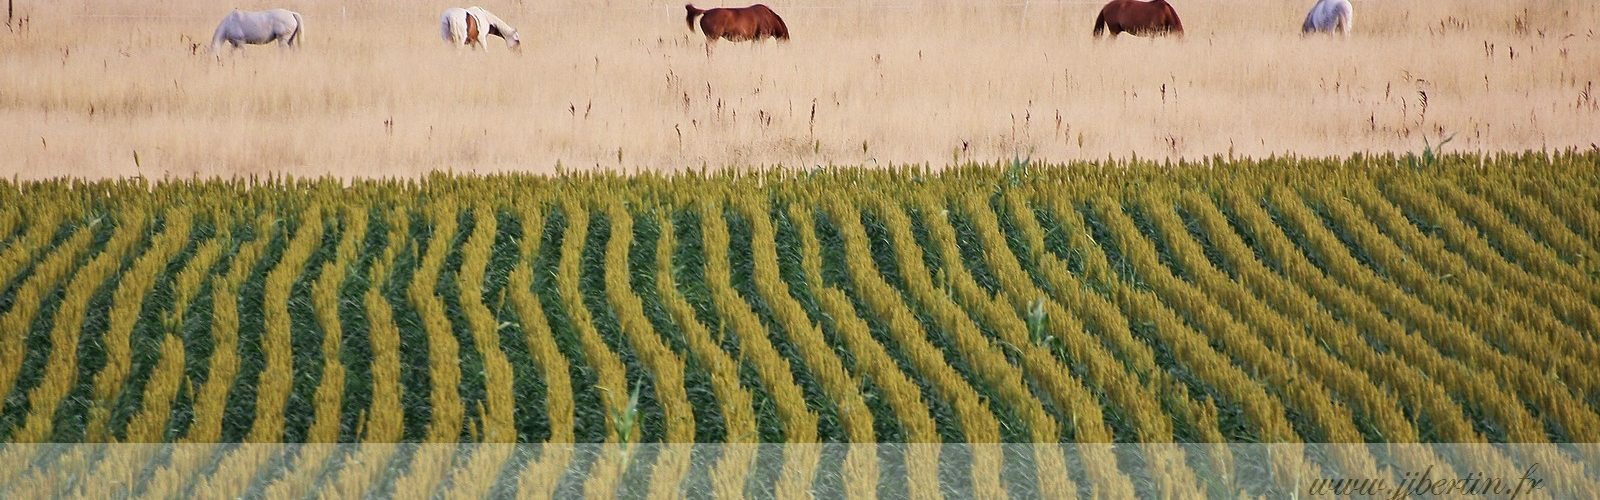 photos animalières drôme jjbertin.fr 2019 paysage avec chevaux